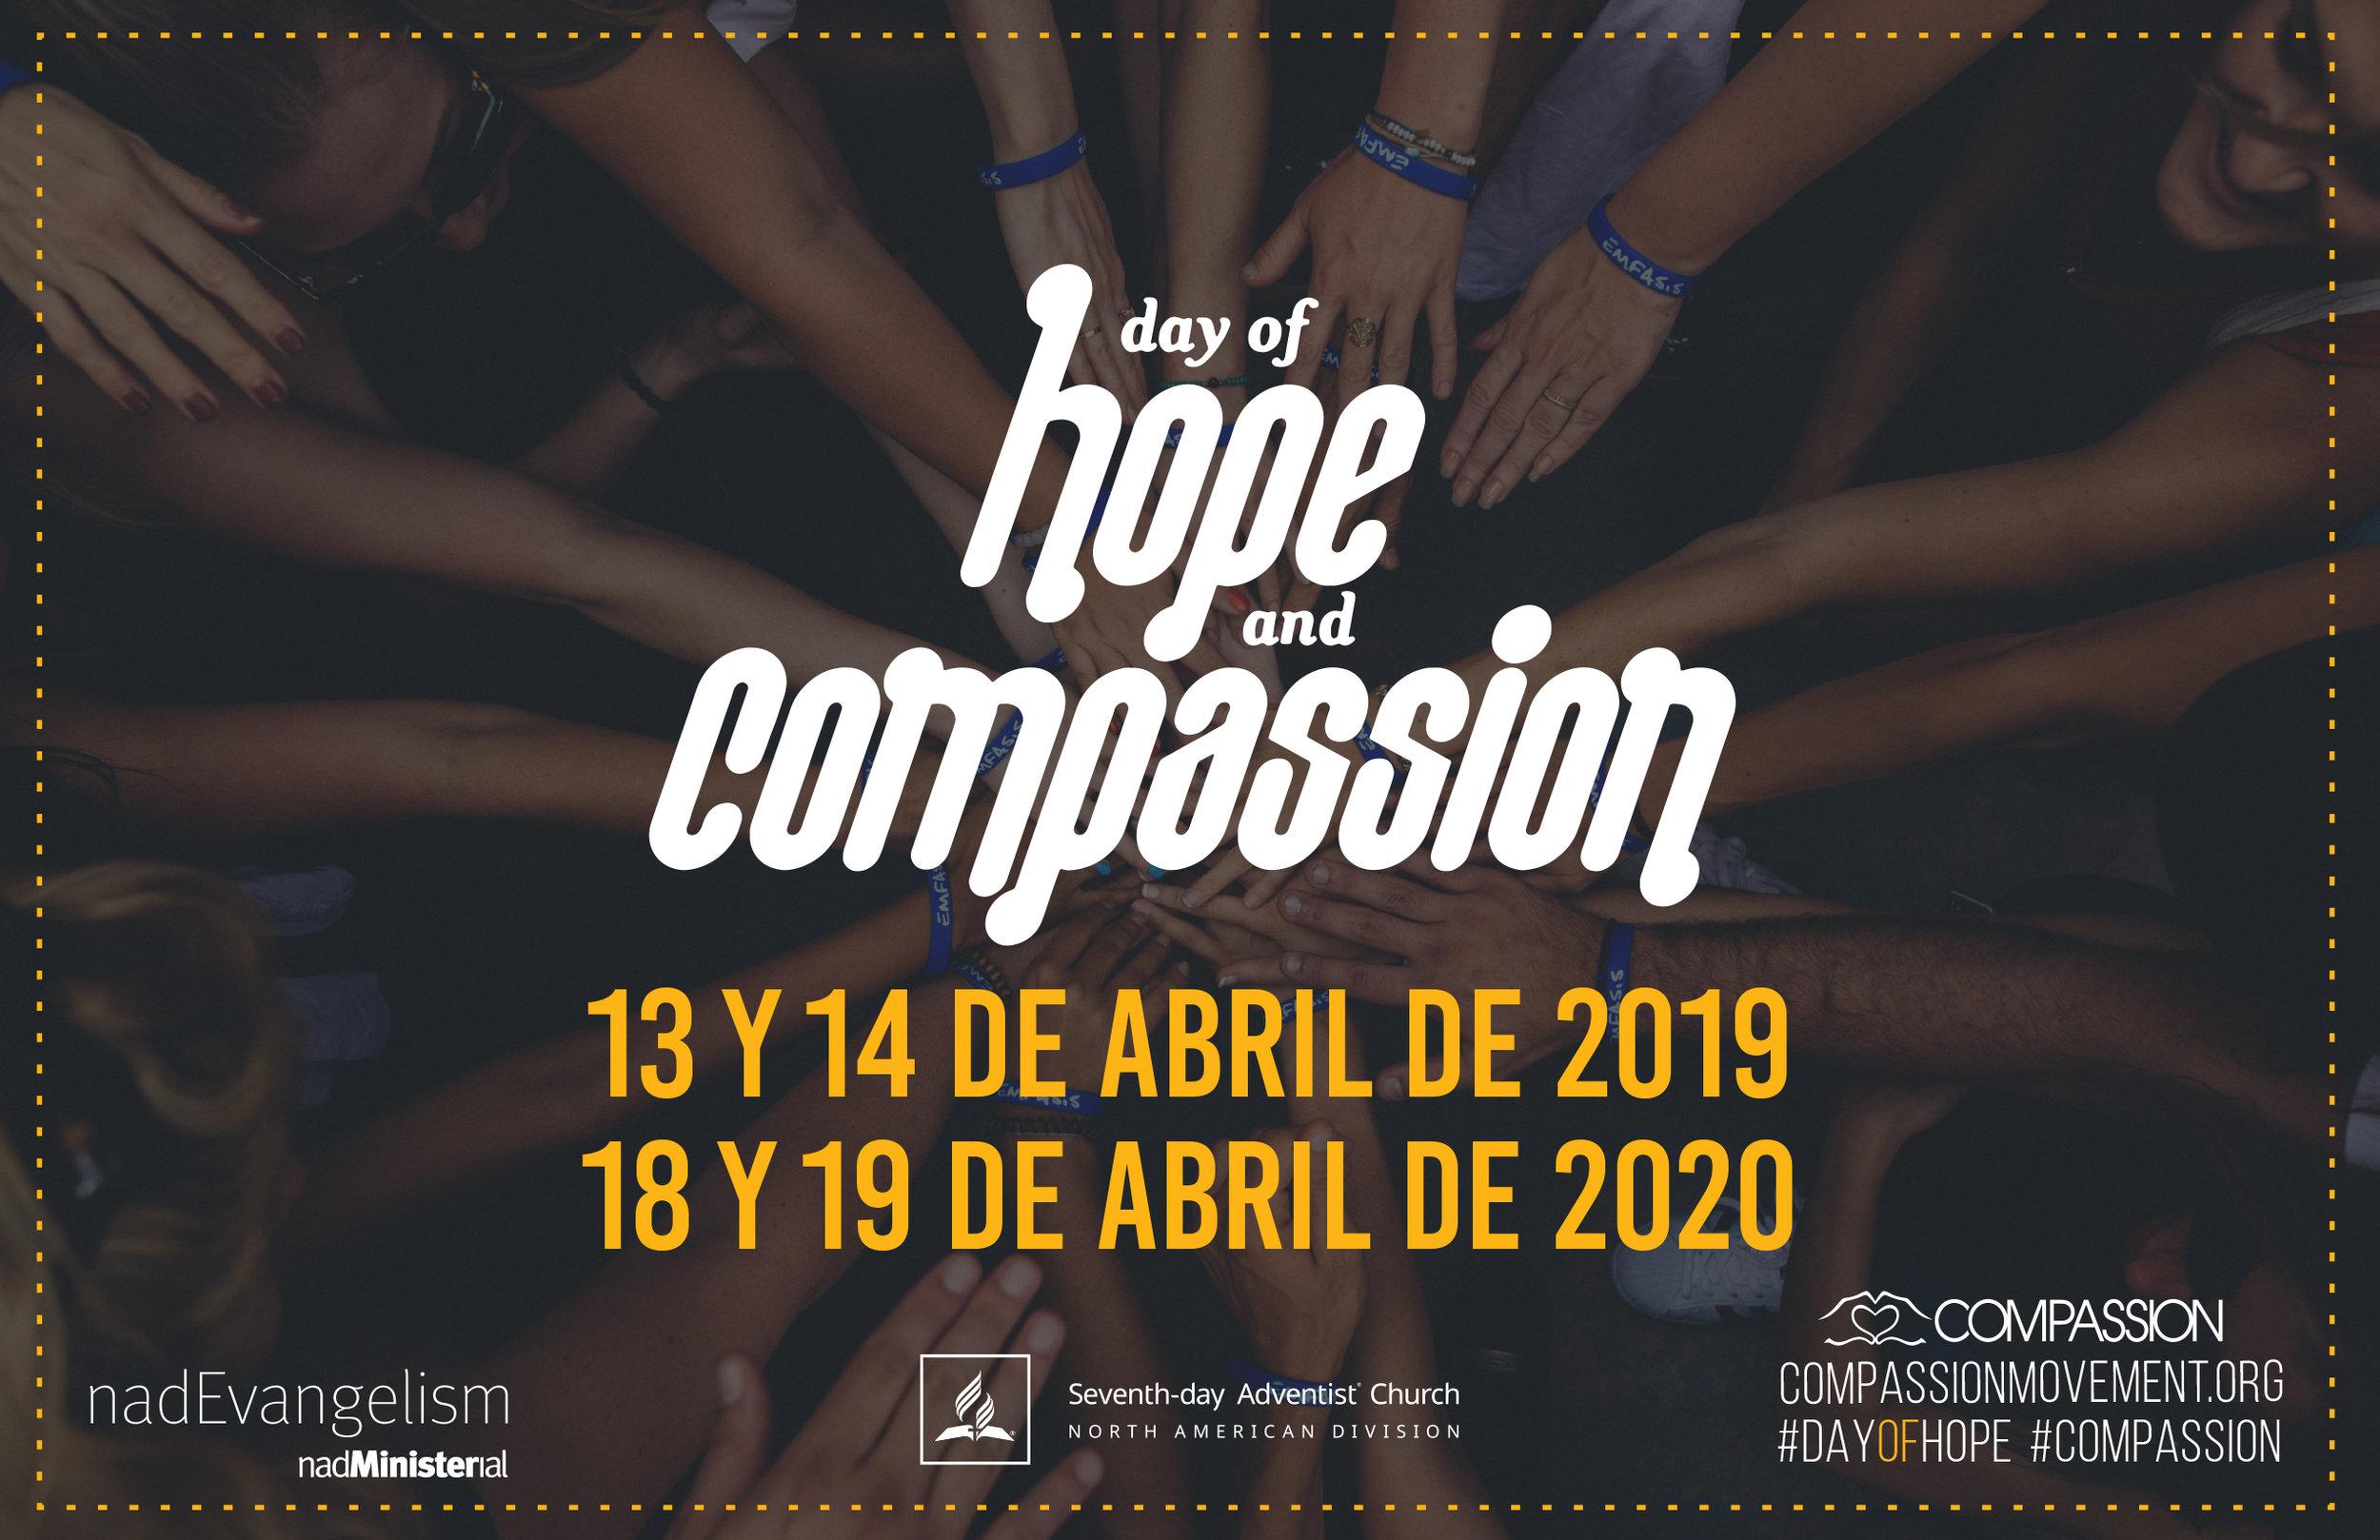 Tarjetas de Compassion-1.jpg